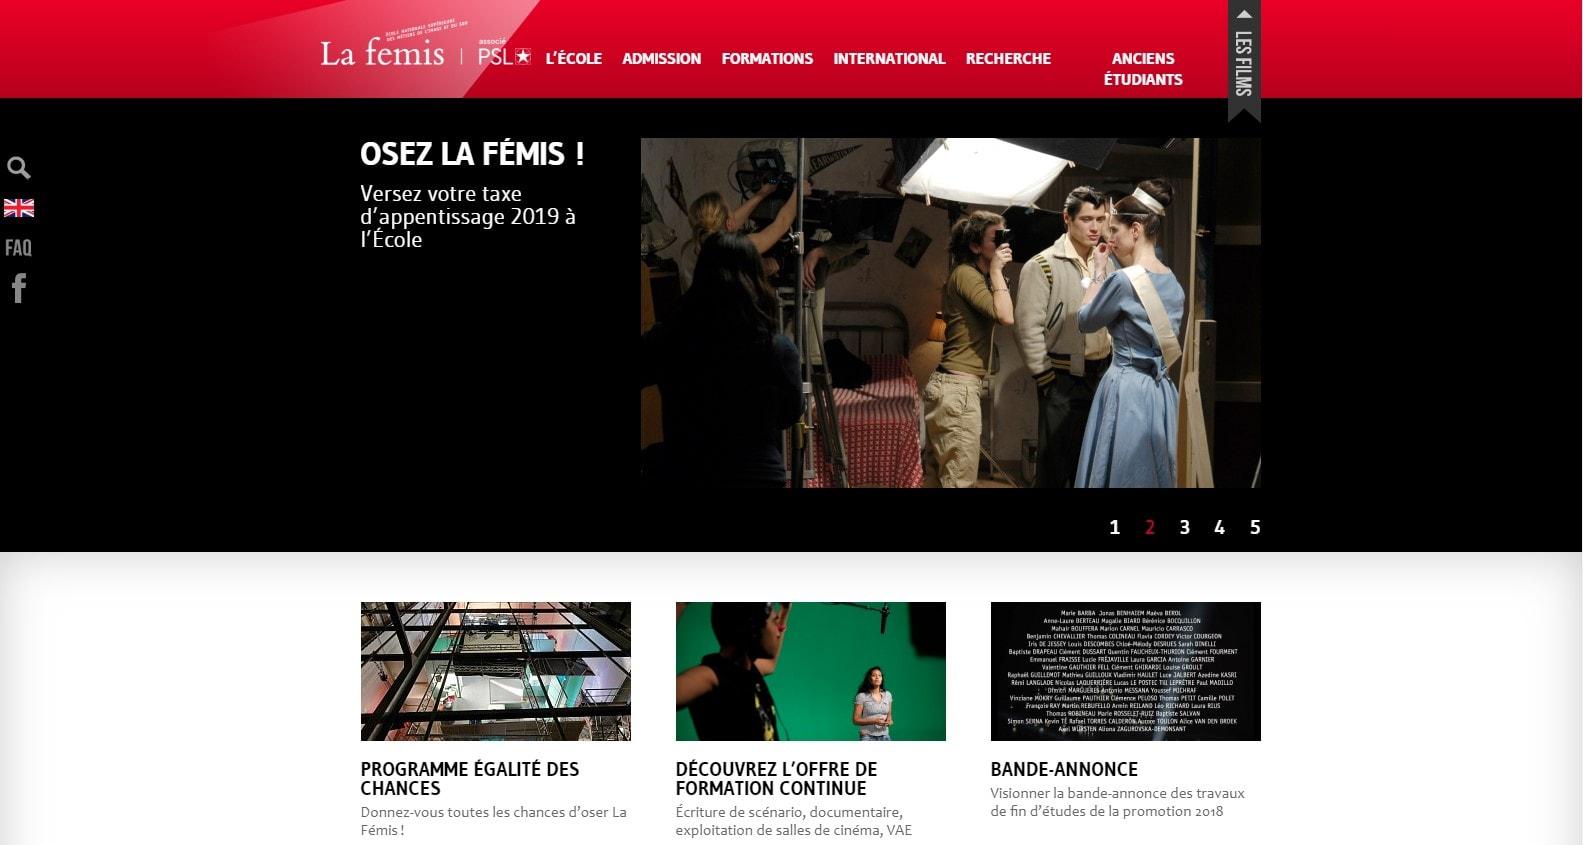 La Fémis film school